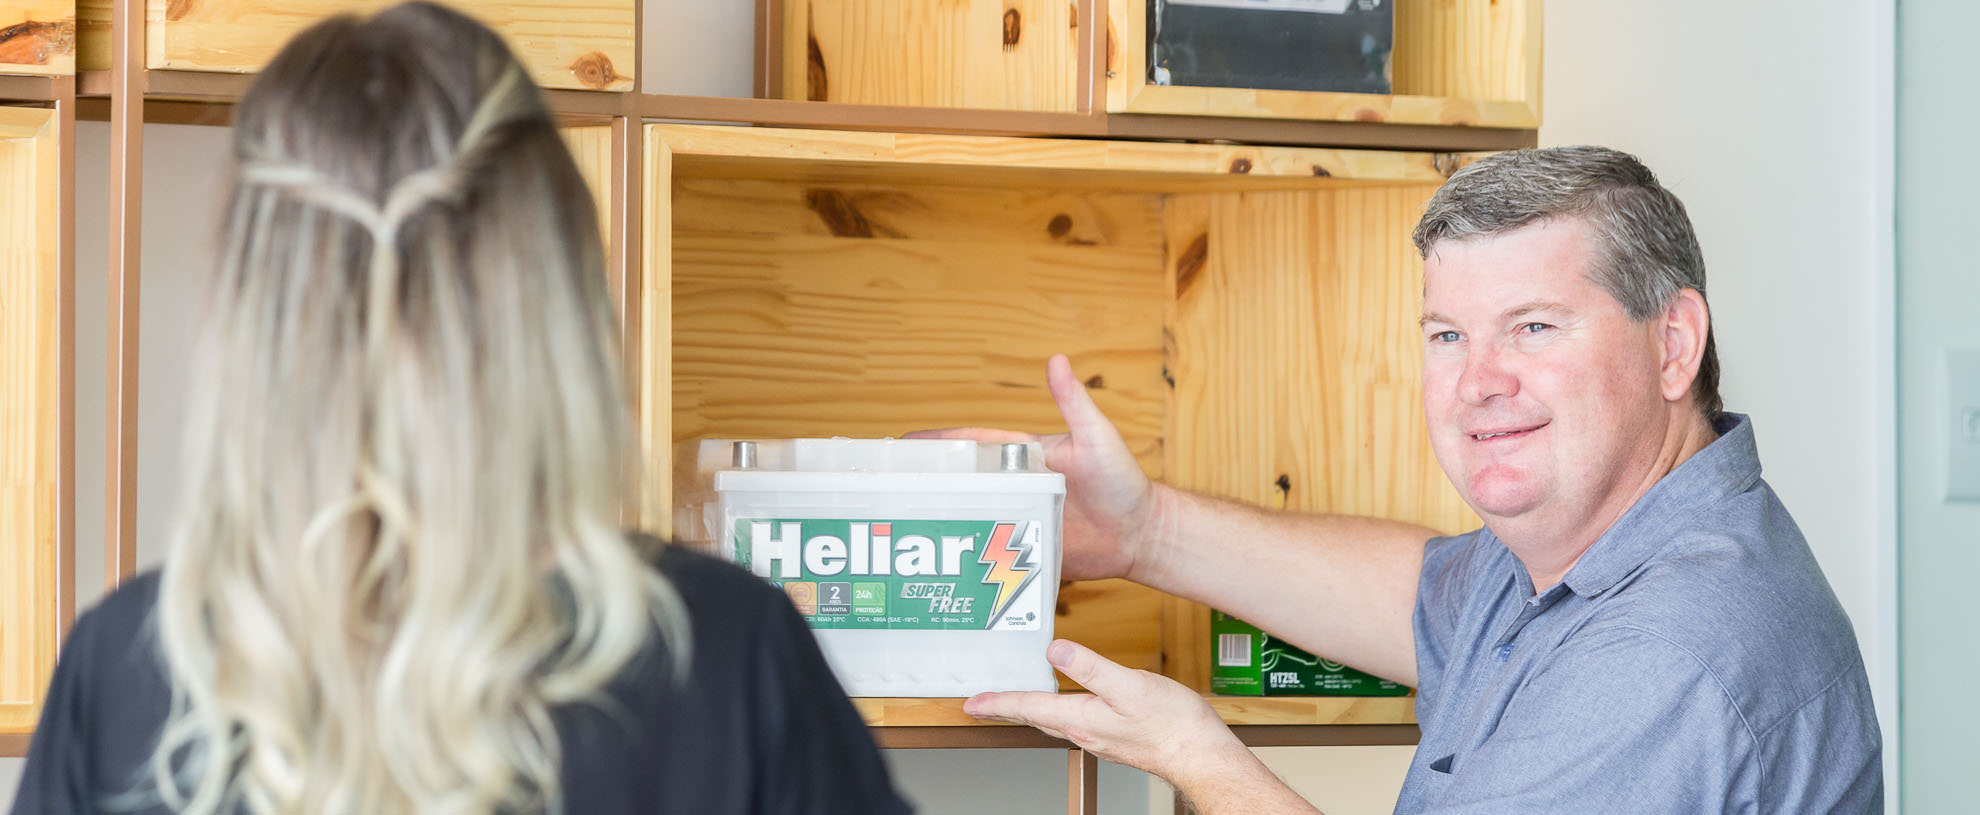 heliar-service-header-crop.jpg